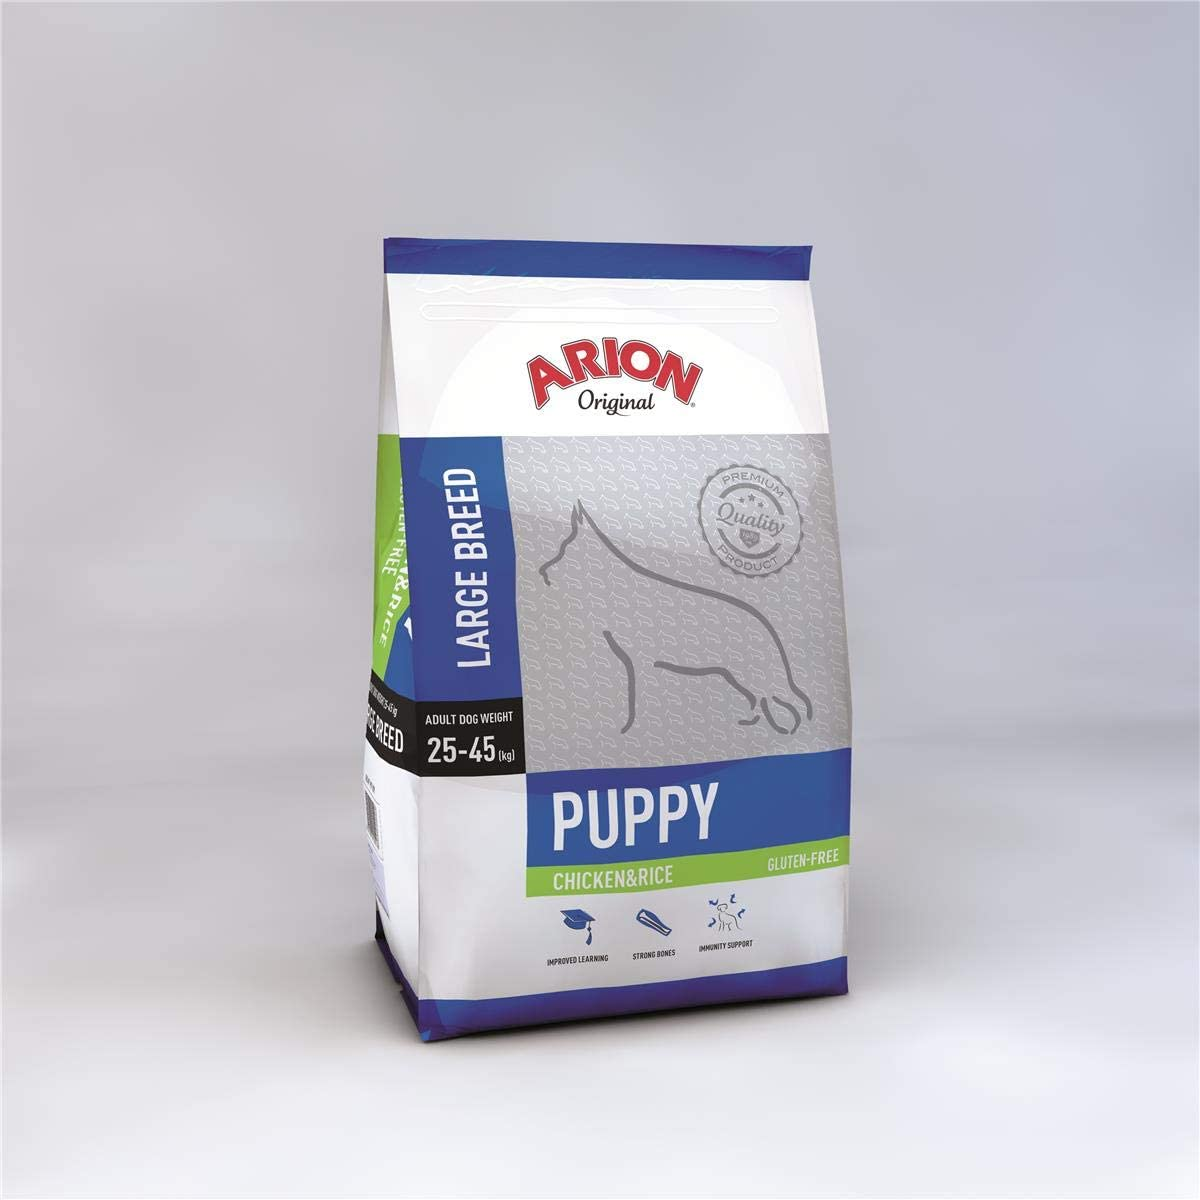 Arion Puppy Large Chicken & Rice Comida para Perros - 12000 gr